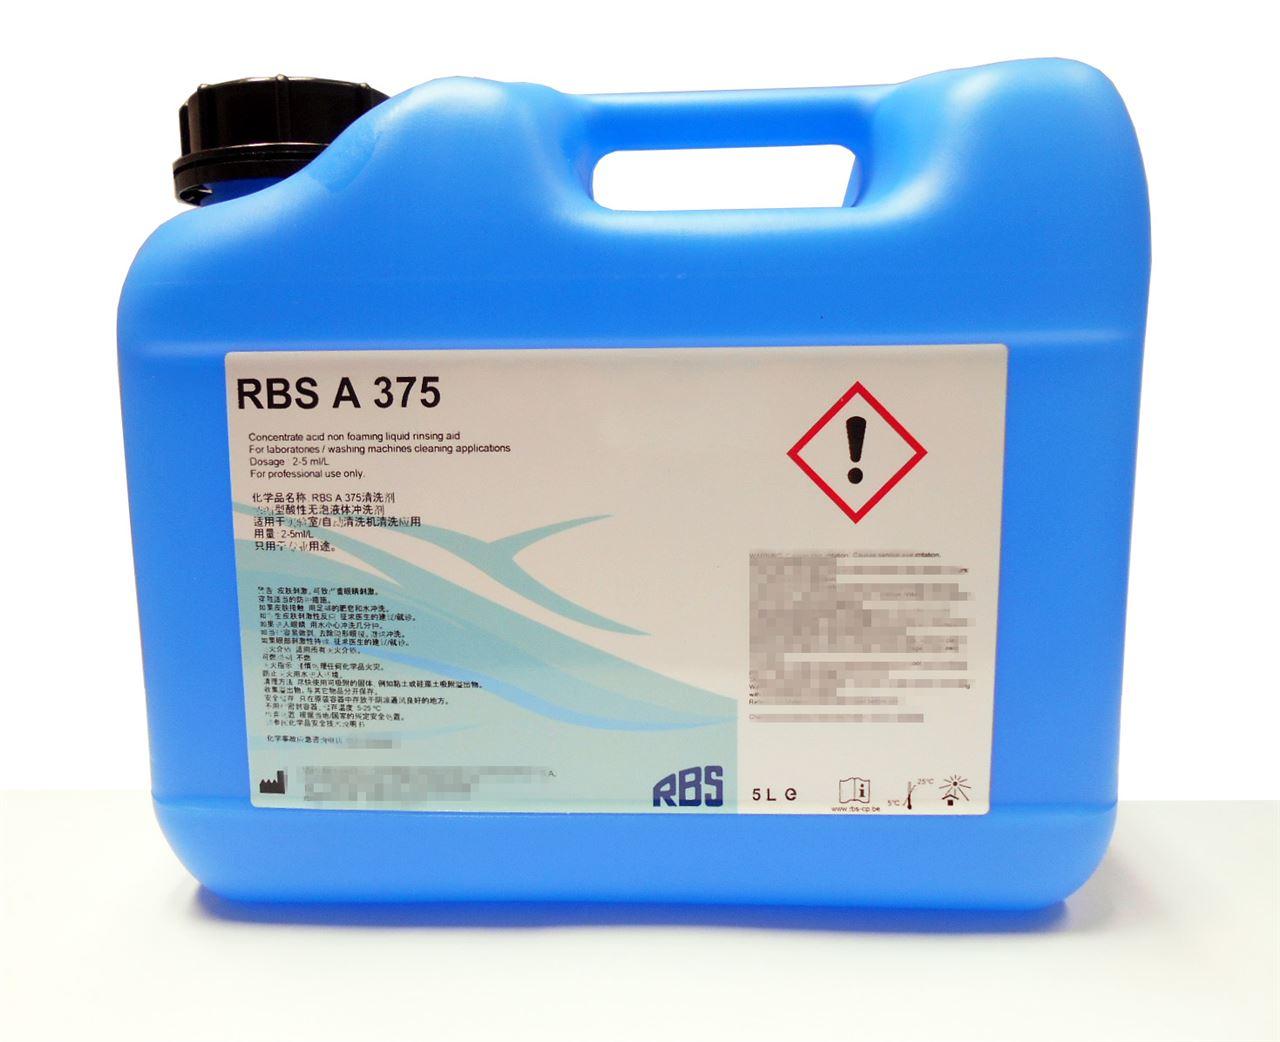 RBS A 375_IM.jpg RBS清洗液及中和剂 清洗液、中和液 第5张